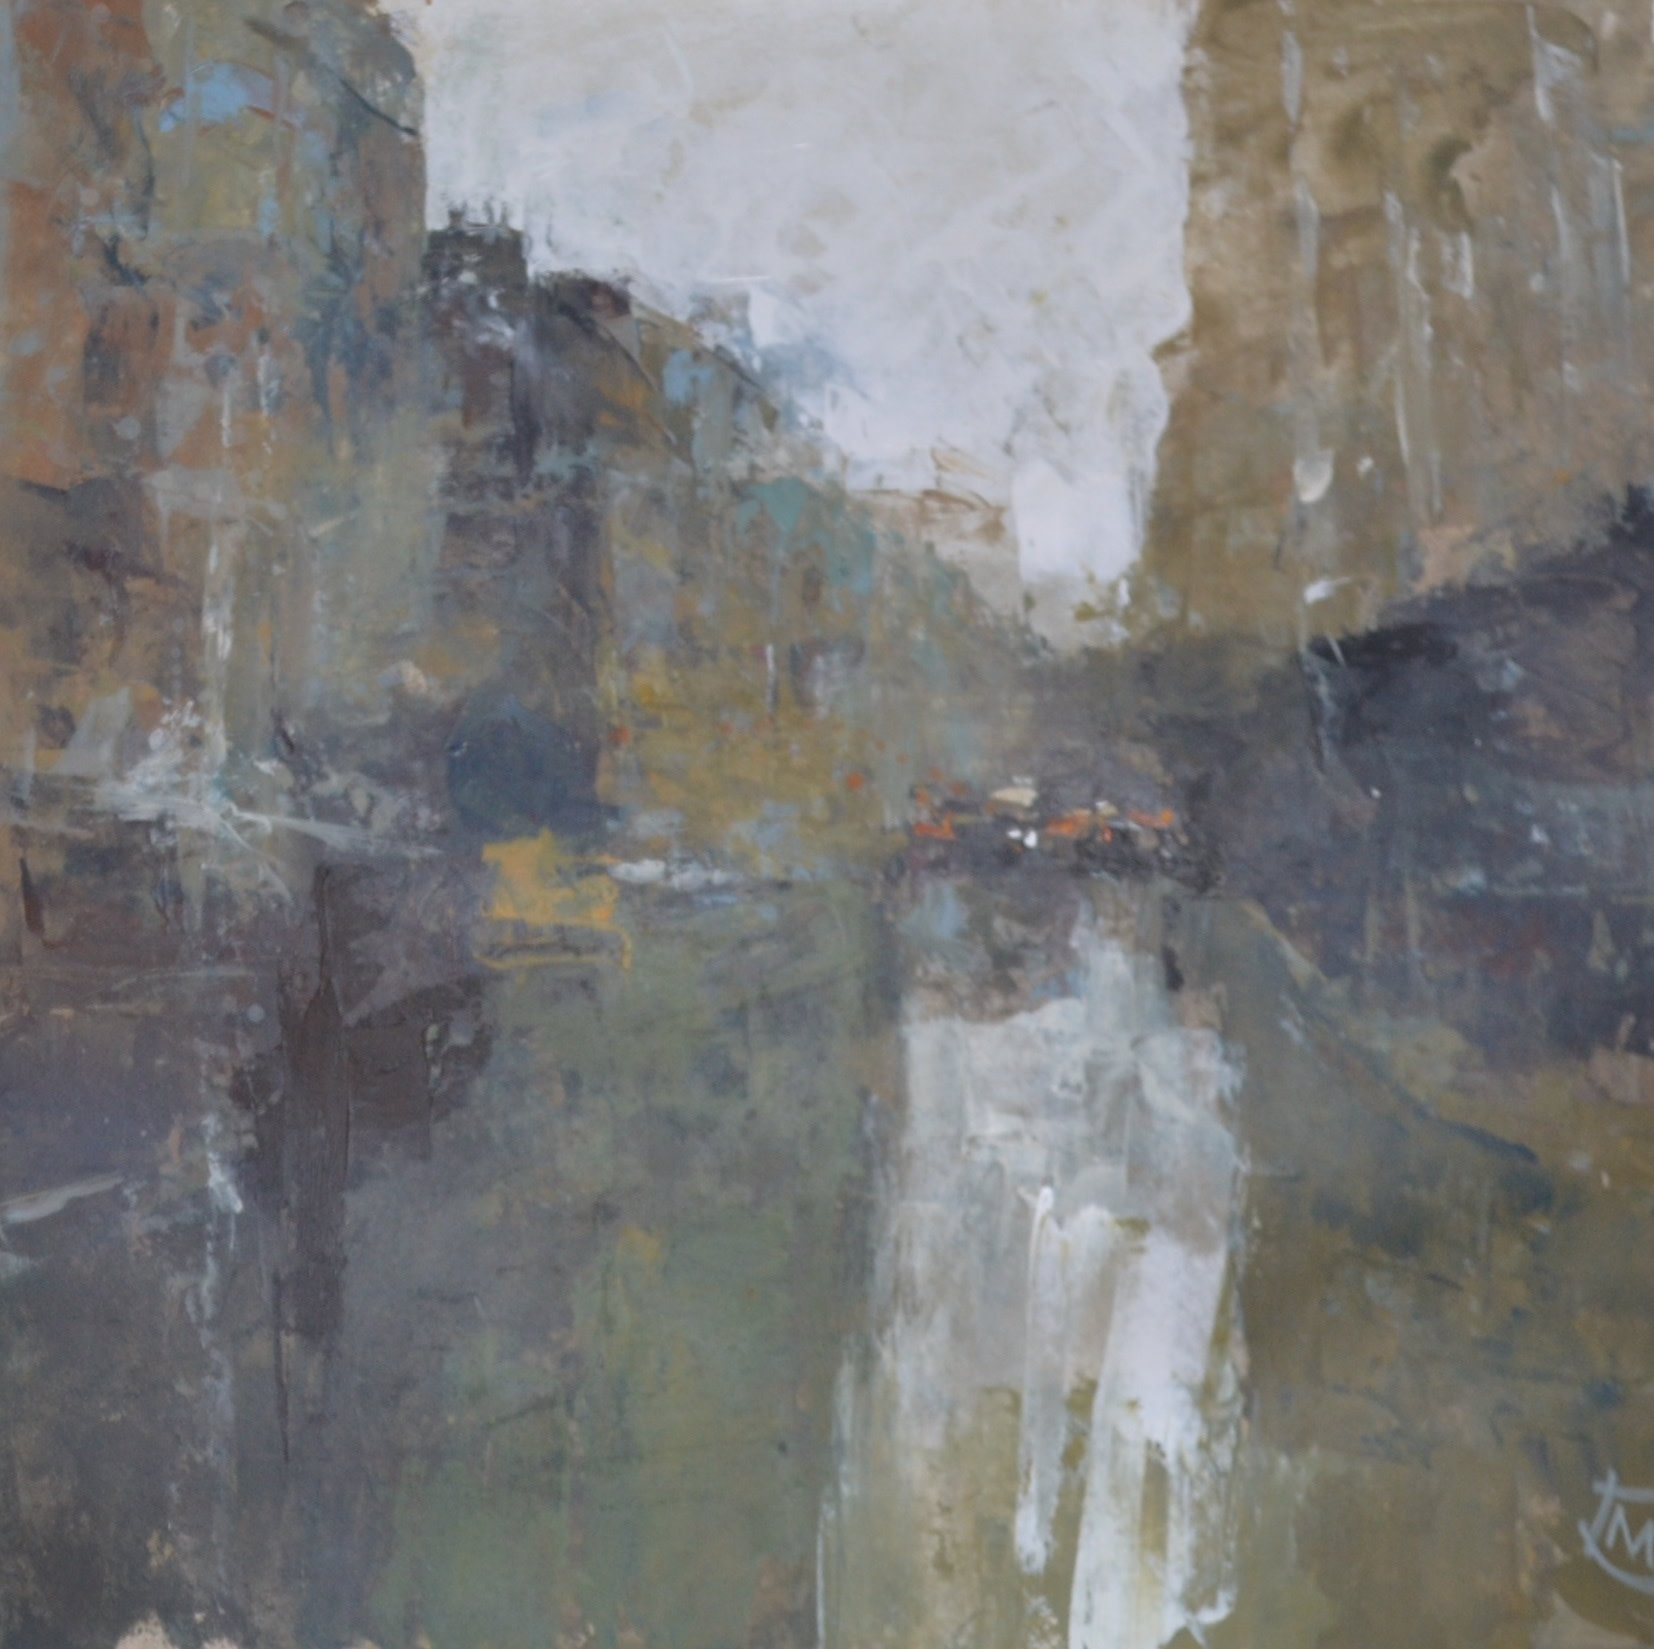 <span class=&#34;link fancybox-details-link&#34;><a href=&#34;/exhibitions/24/works/artworks_standalone10744/&#34;>View Detail Page</a></span><div class=&#34;artist&#34;><span class=&#34;artist&#34;><strong>Colin Merrin</strong></span></div><div class=&#34;title&#34;><em>Composition 223</em></div><div class=&#34;medium&#34;>acrylic</div><div class=&#34;dimensions&#34;>52x52cm</div>